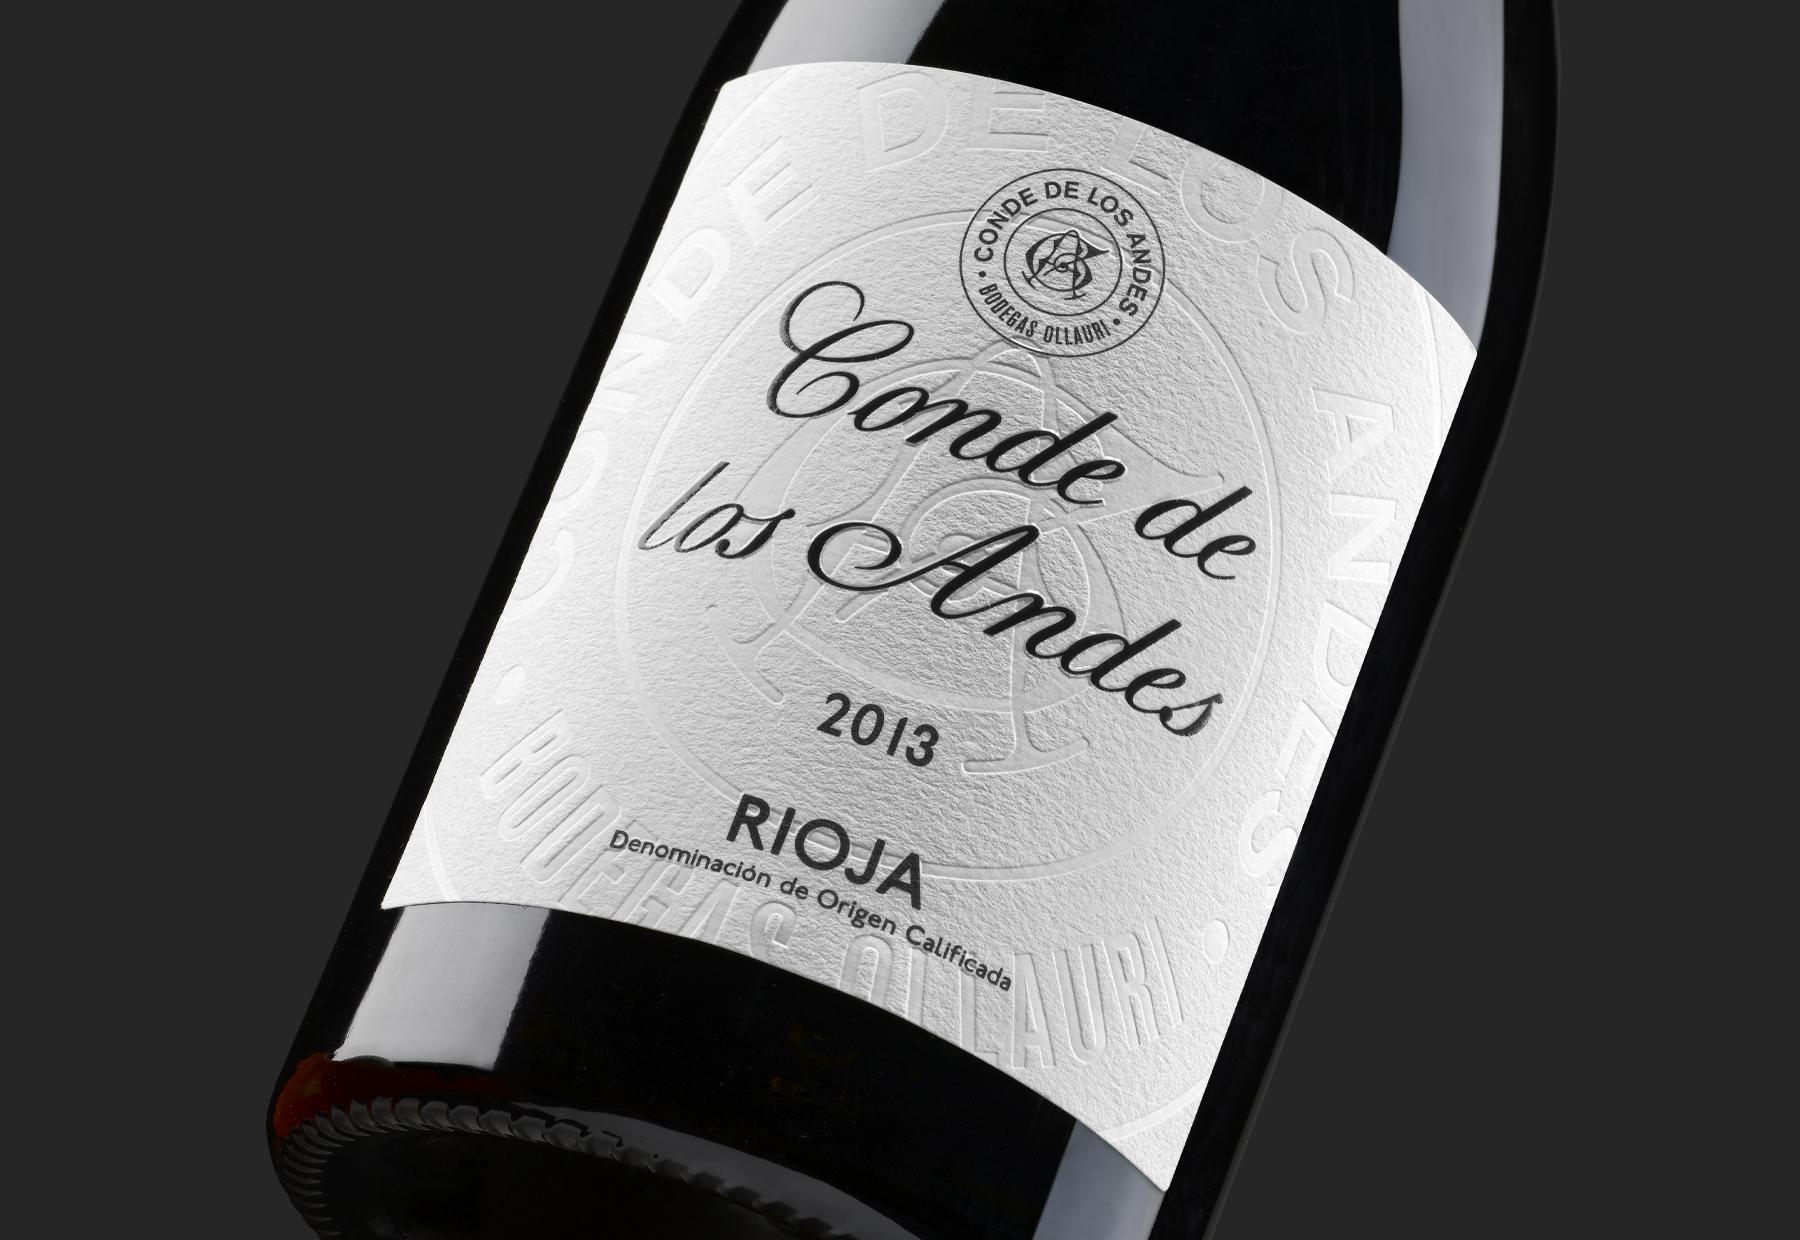 """Conde De Los Andes"" the Redesign of an Historical Rioja by Moruba"